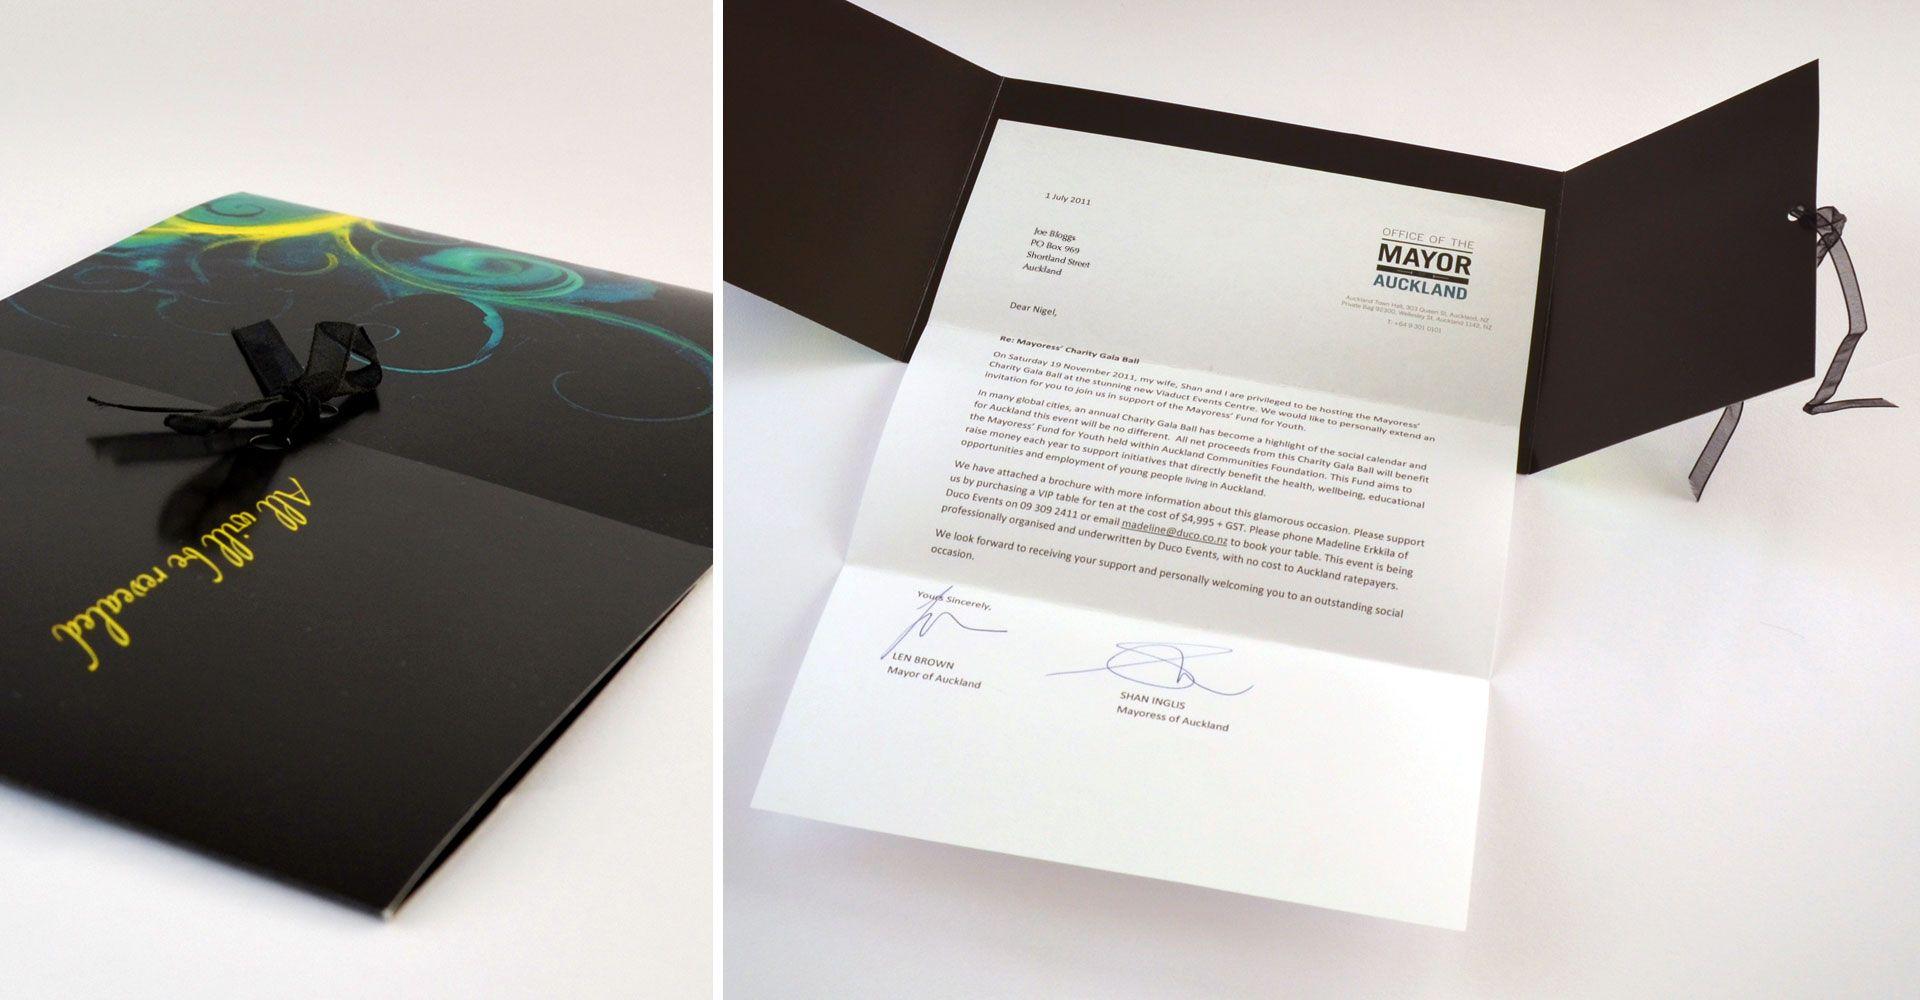 Len Klassisches Design mizuno golden box packaging by talent direct mail